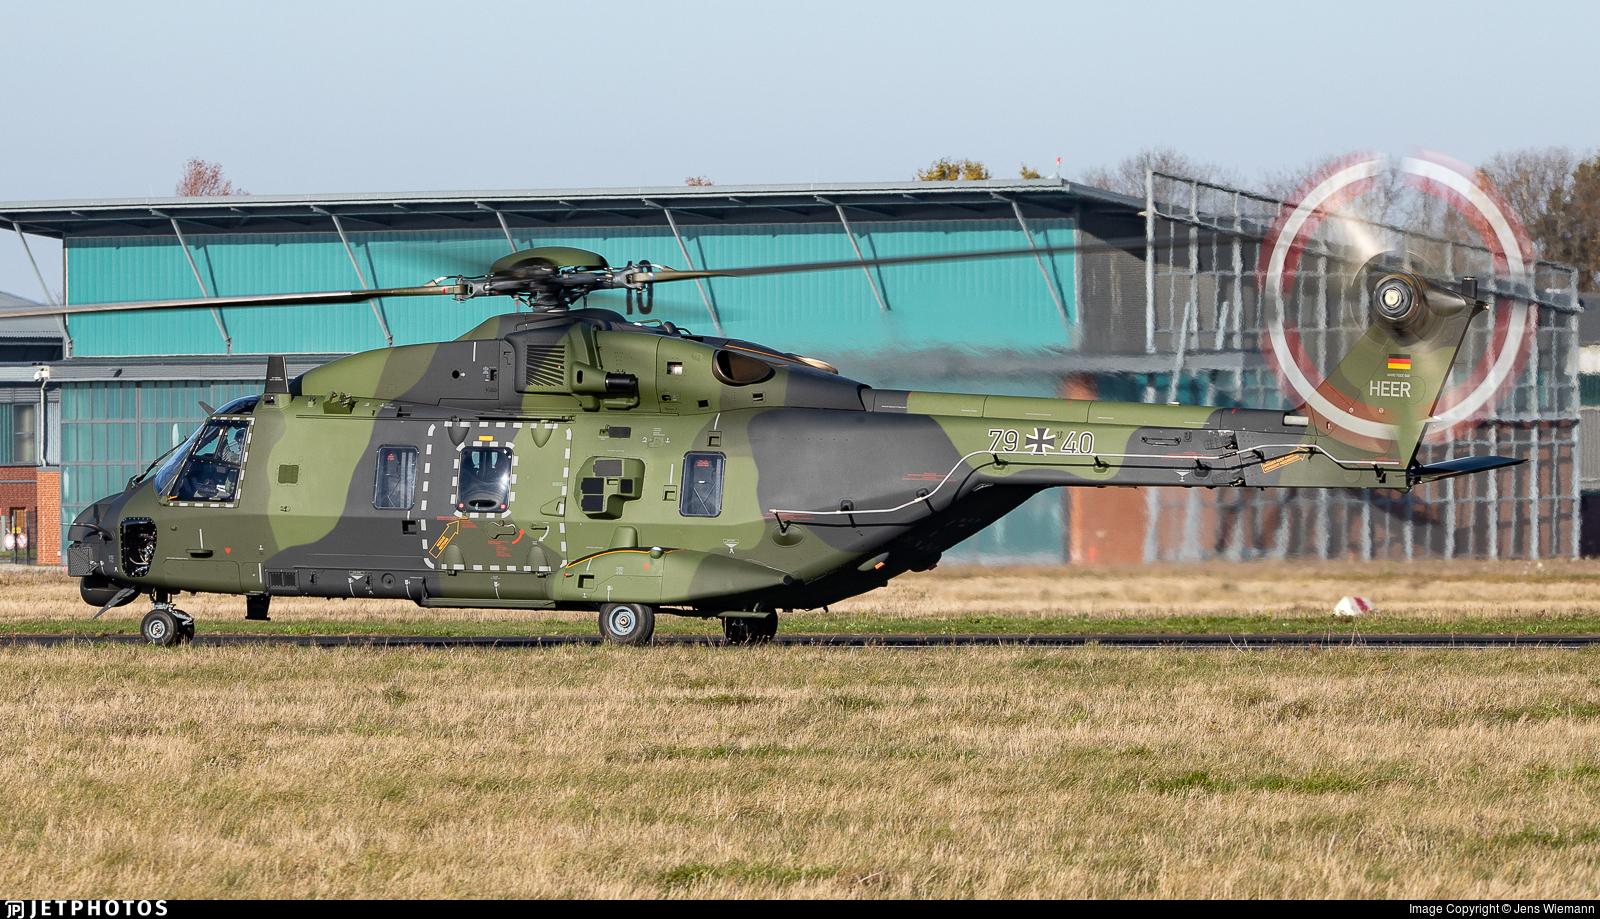 79-40 - NH Industries NH-90TTH - Germany - Army